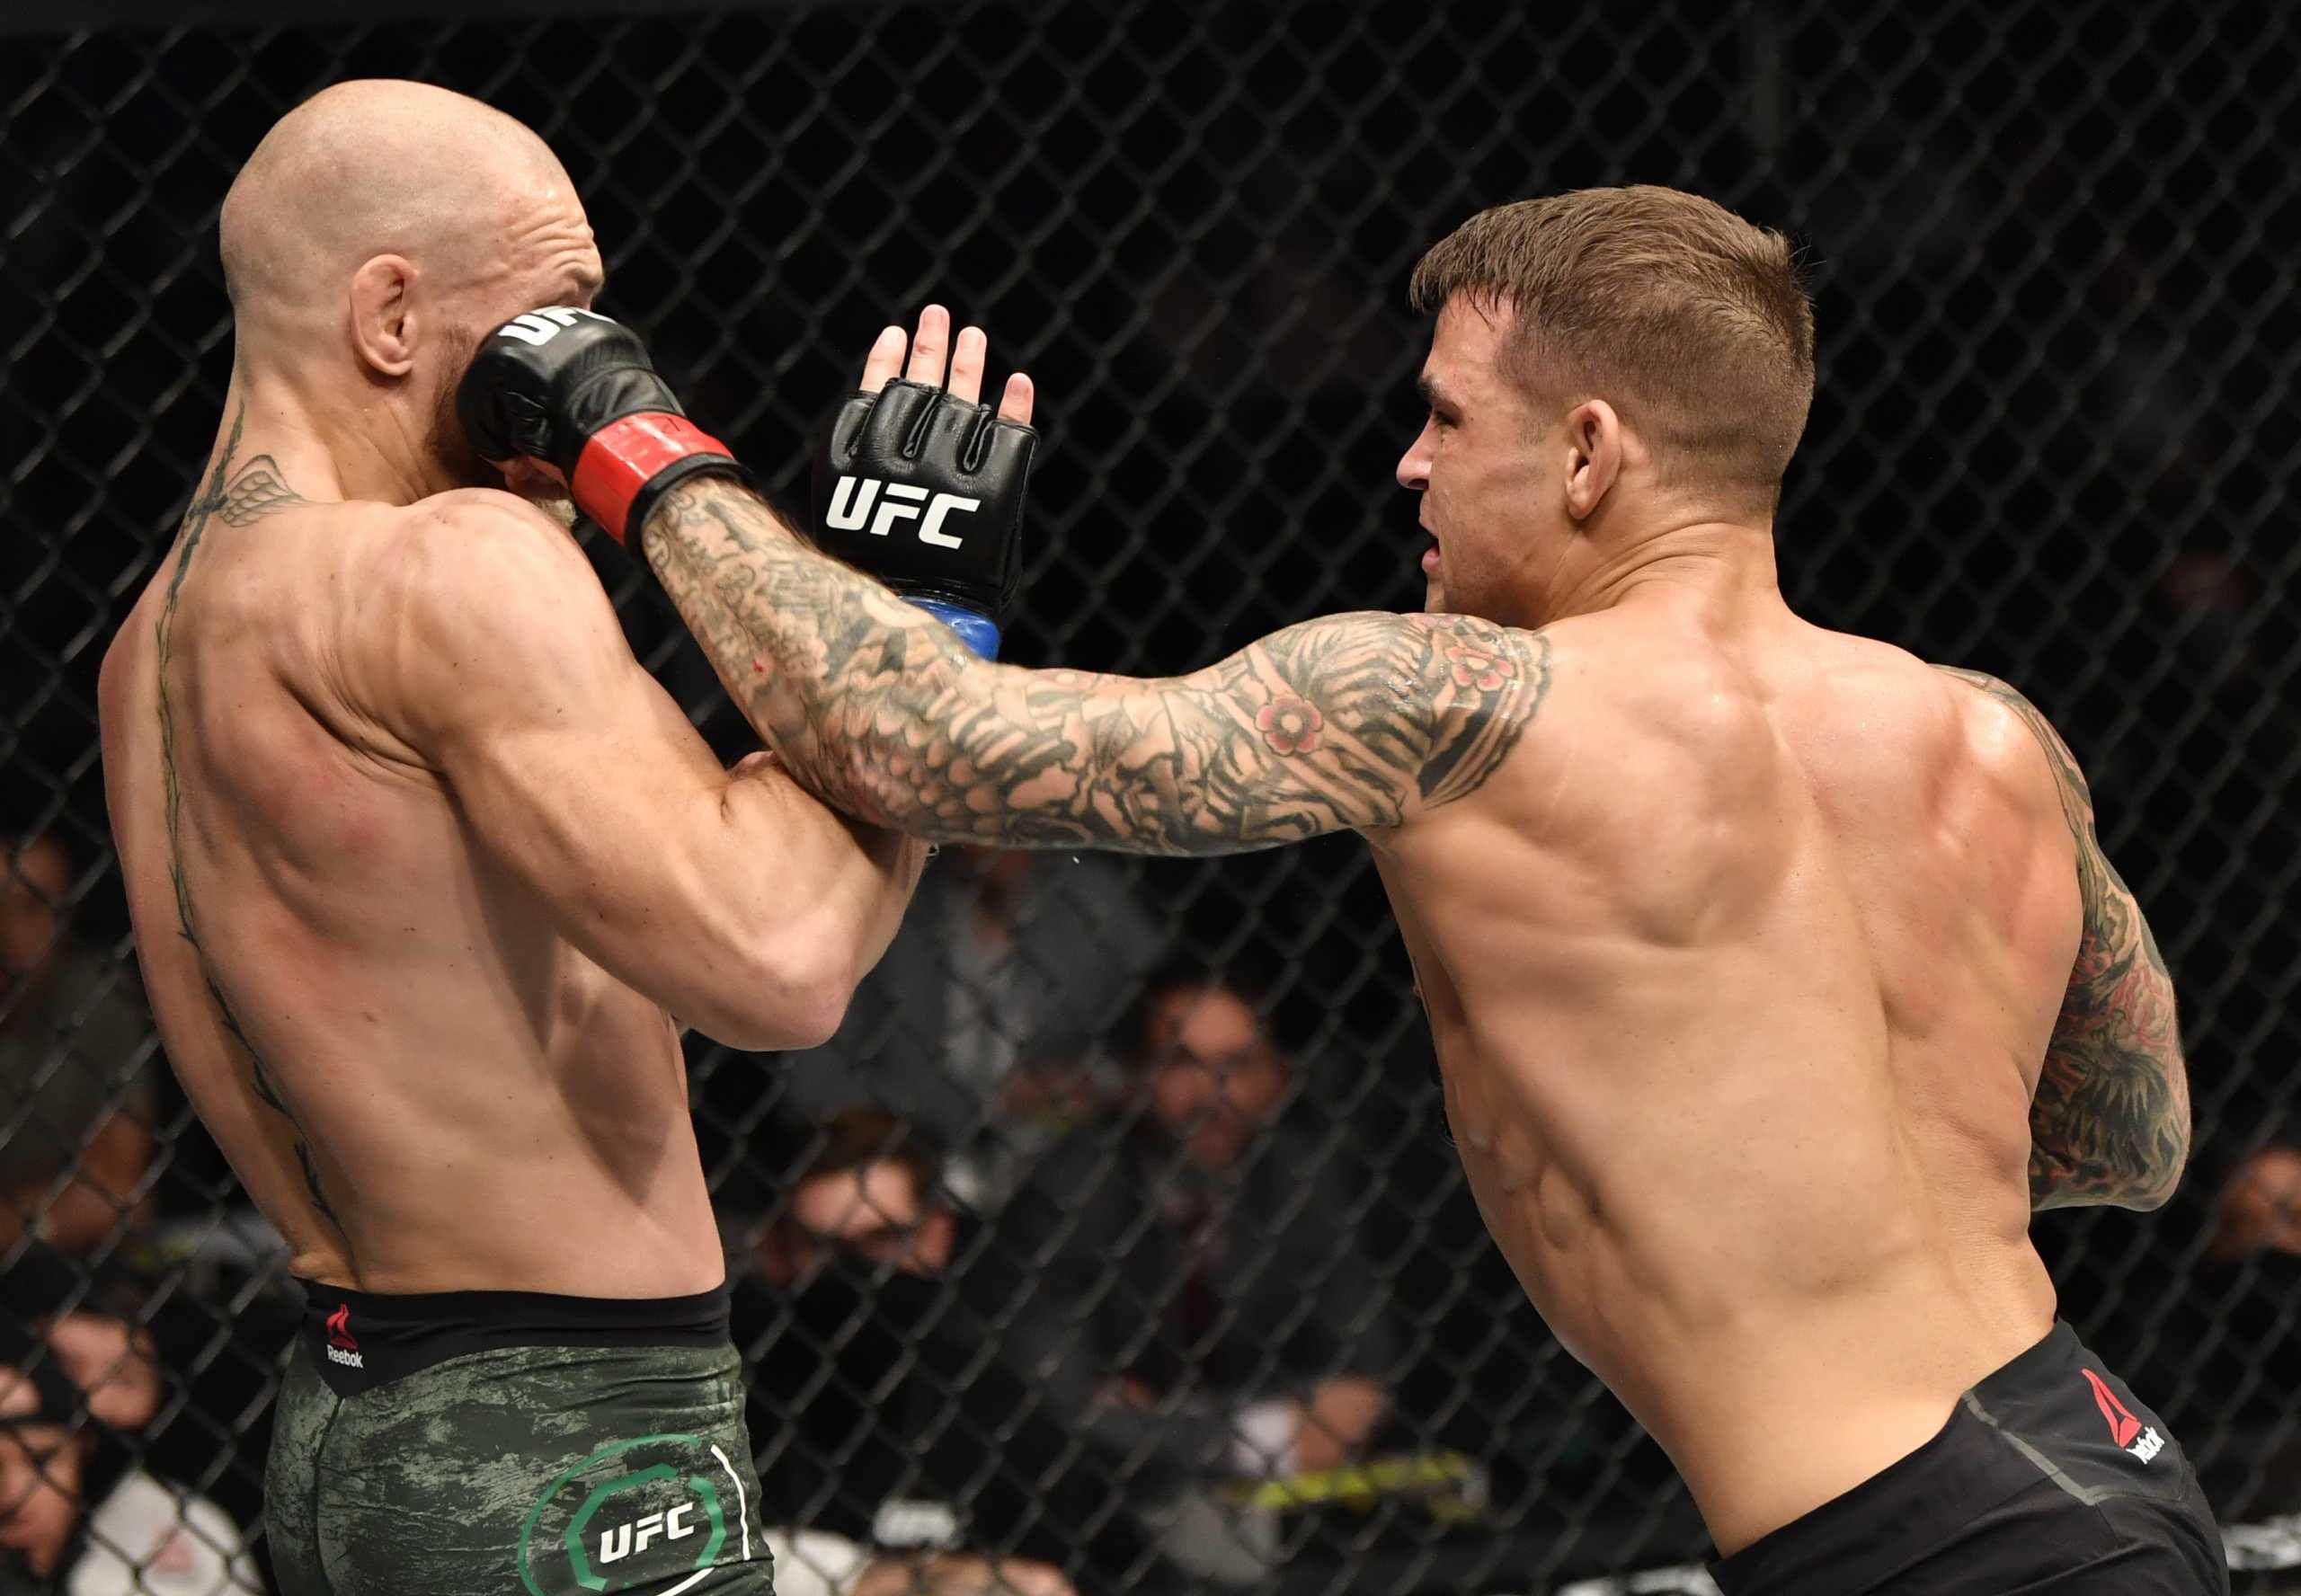 UFC: Ο Πουαριέ διέλυσε τον ΜακΓκρέγκορ (video)